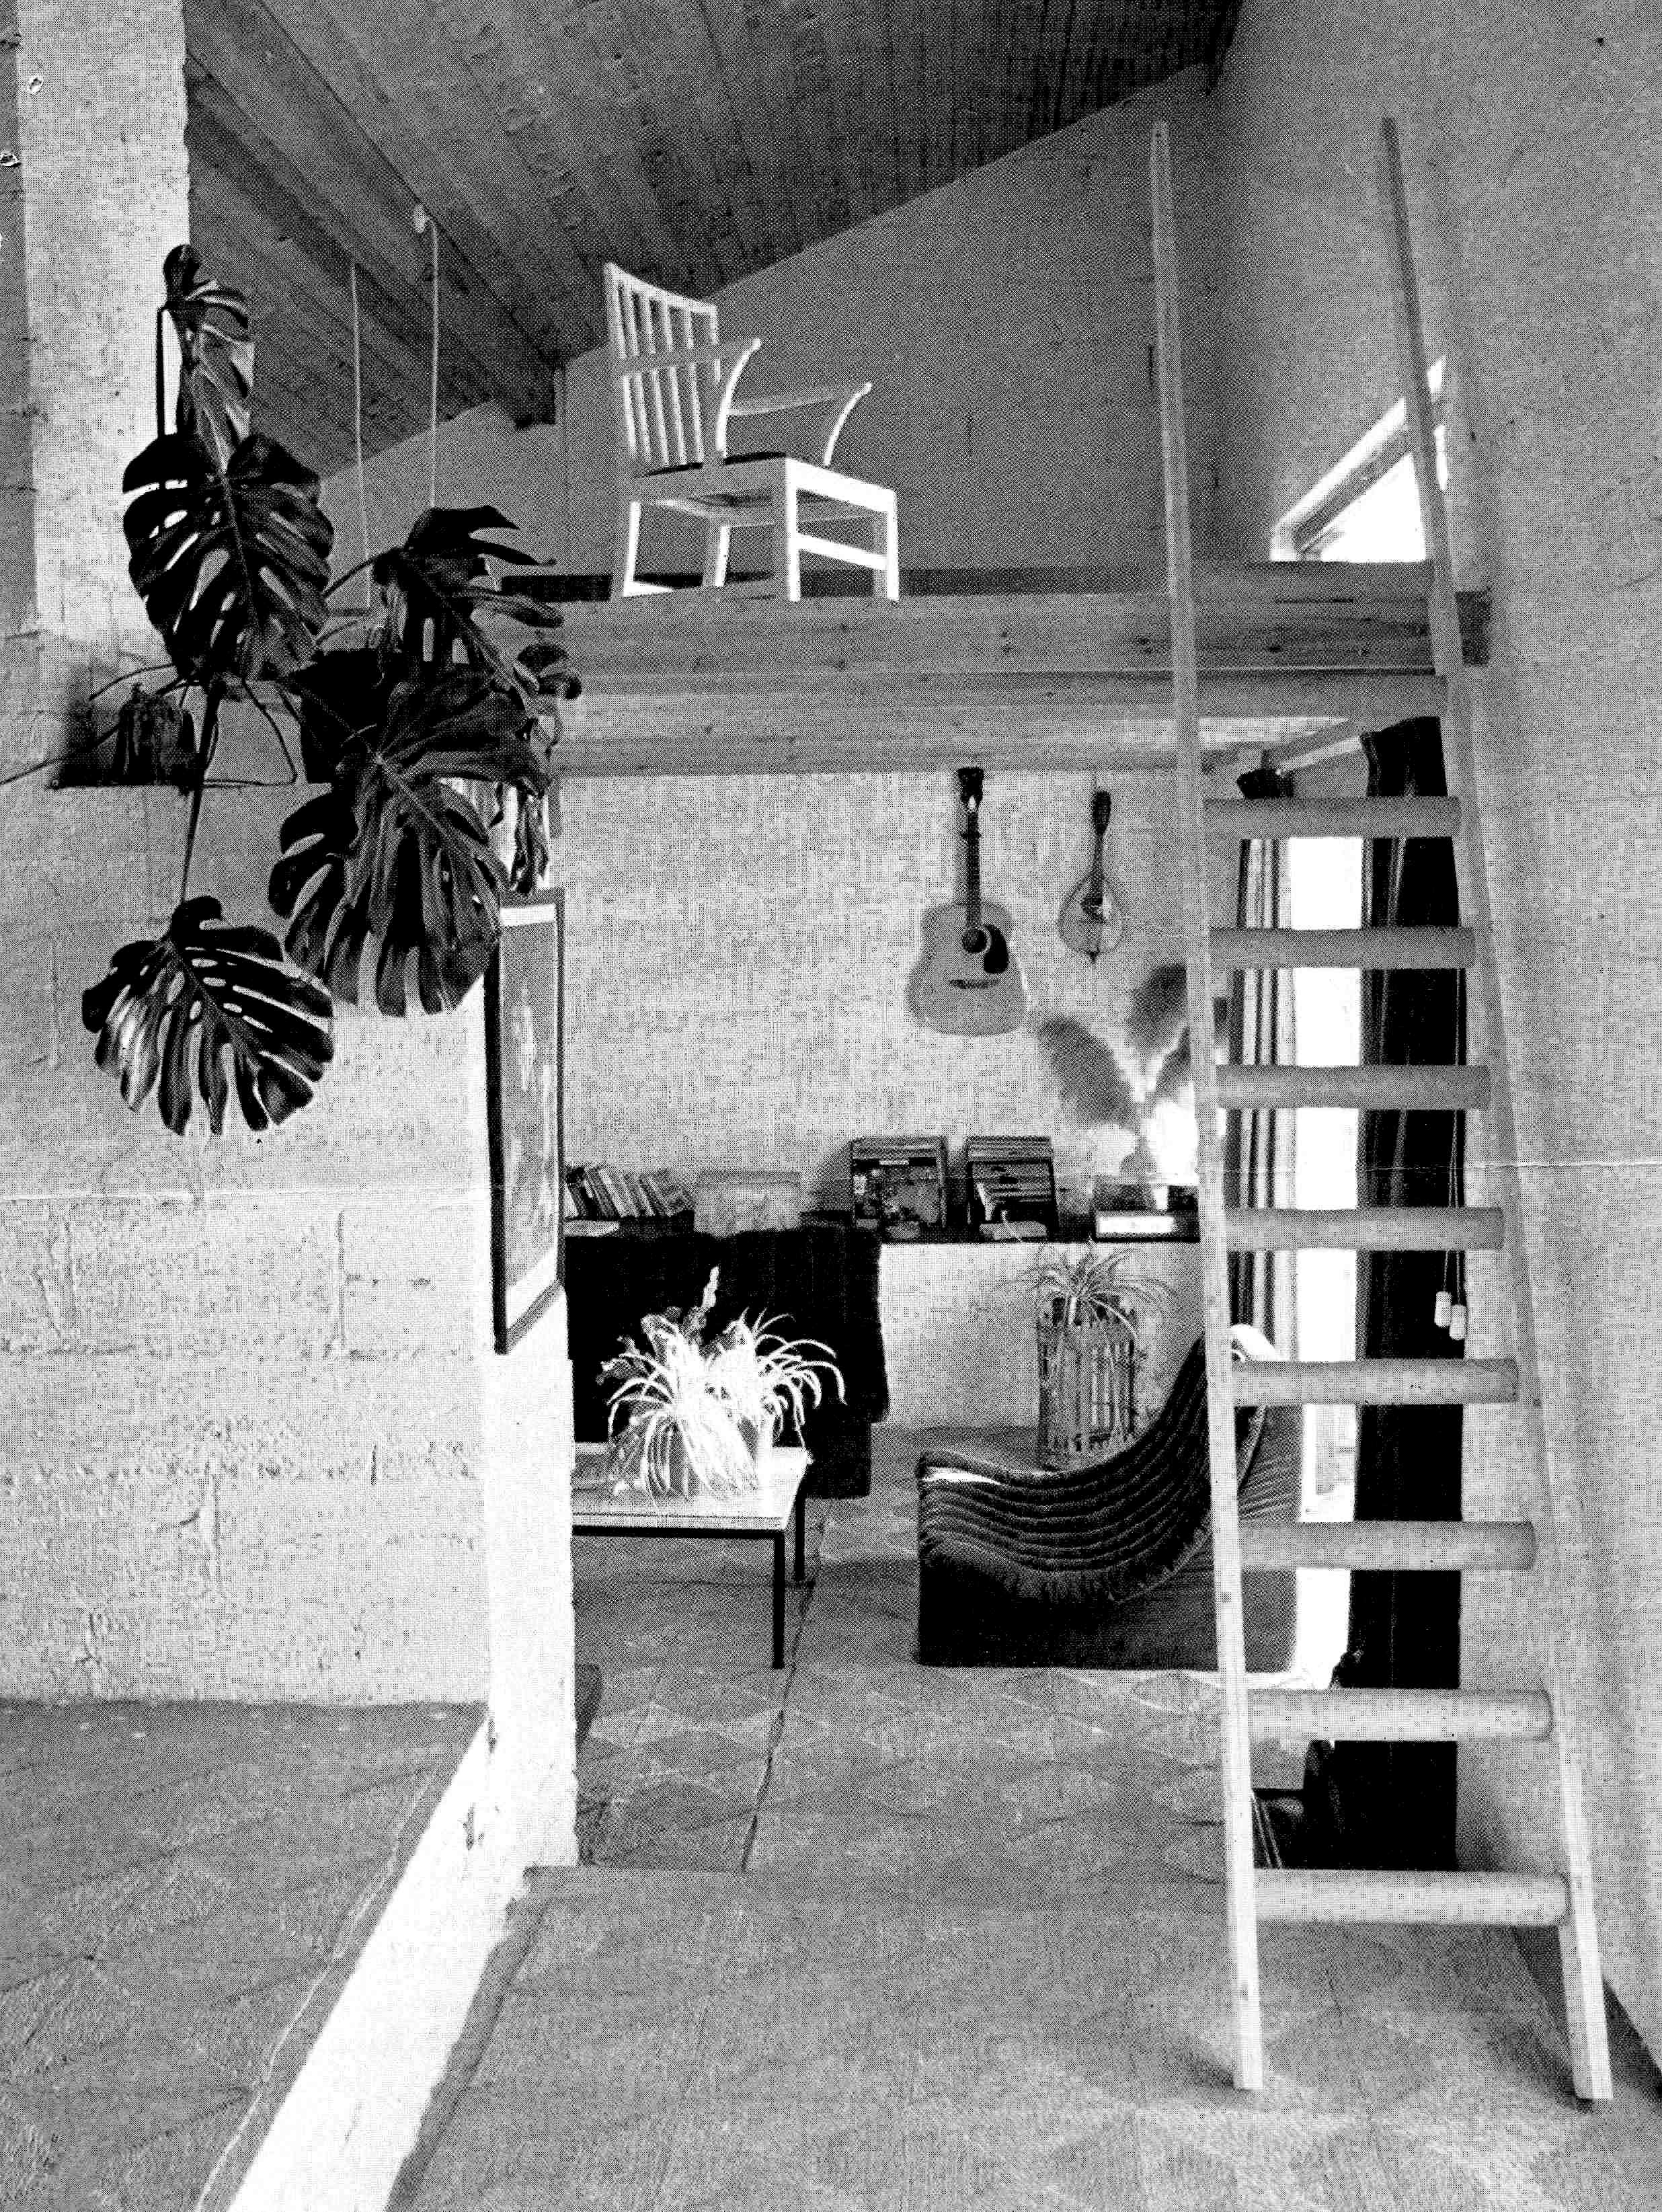 Gower House Image Int.jpg